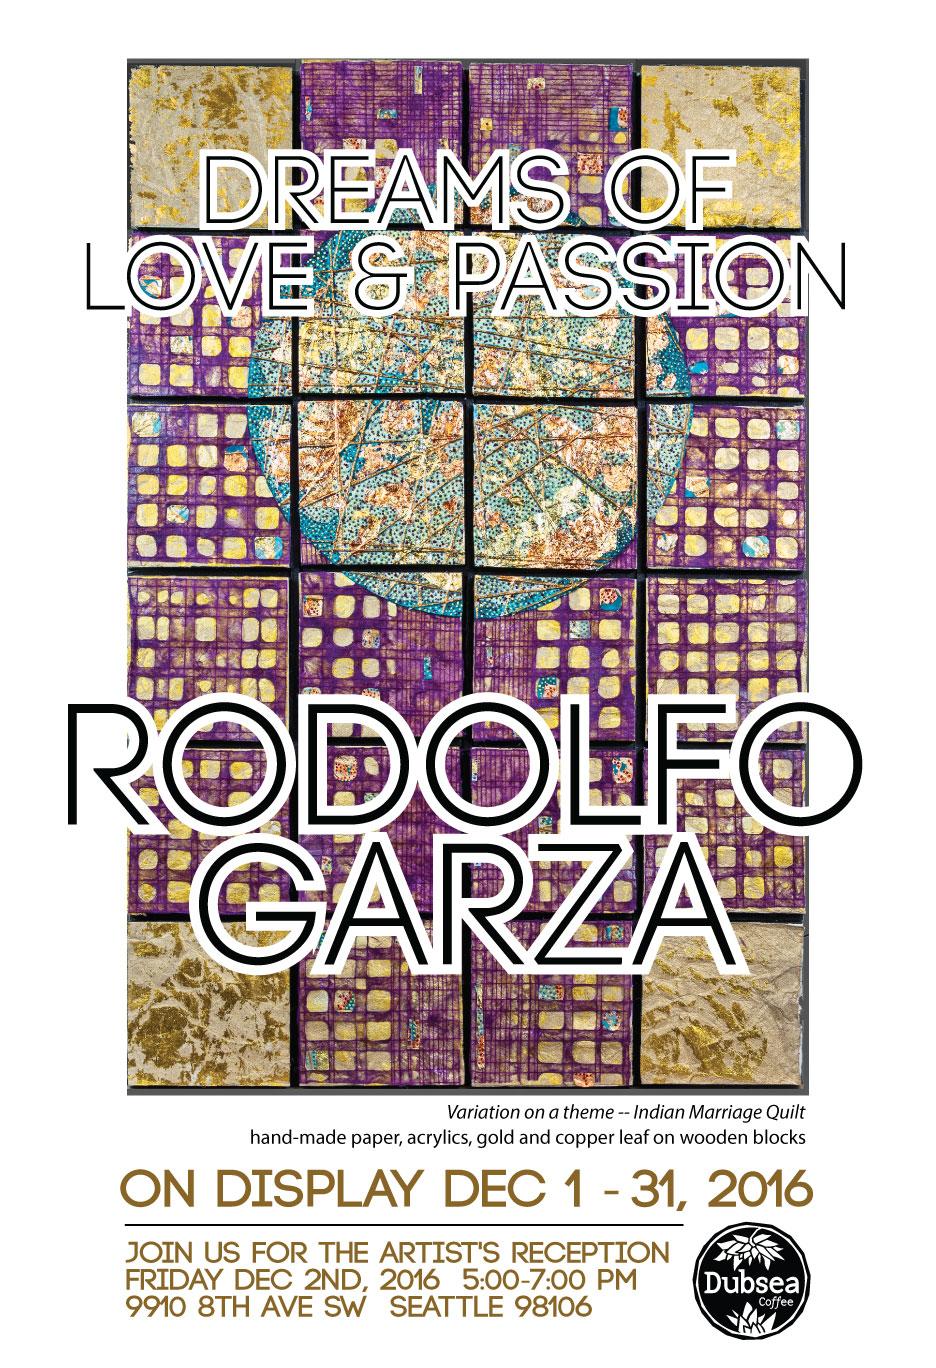 RodolfoGarzaPoster.jpg